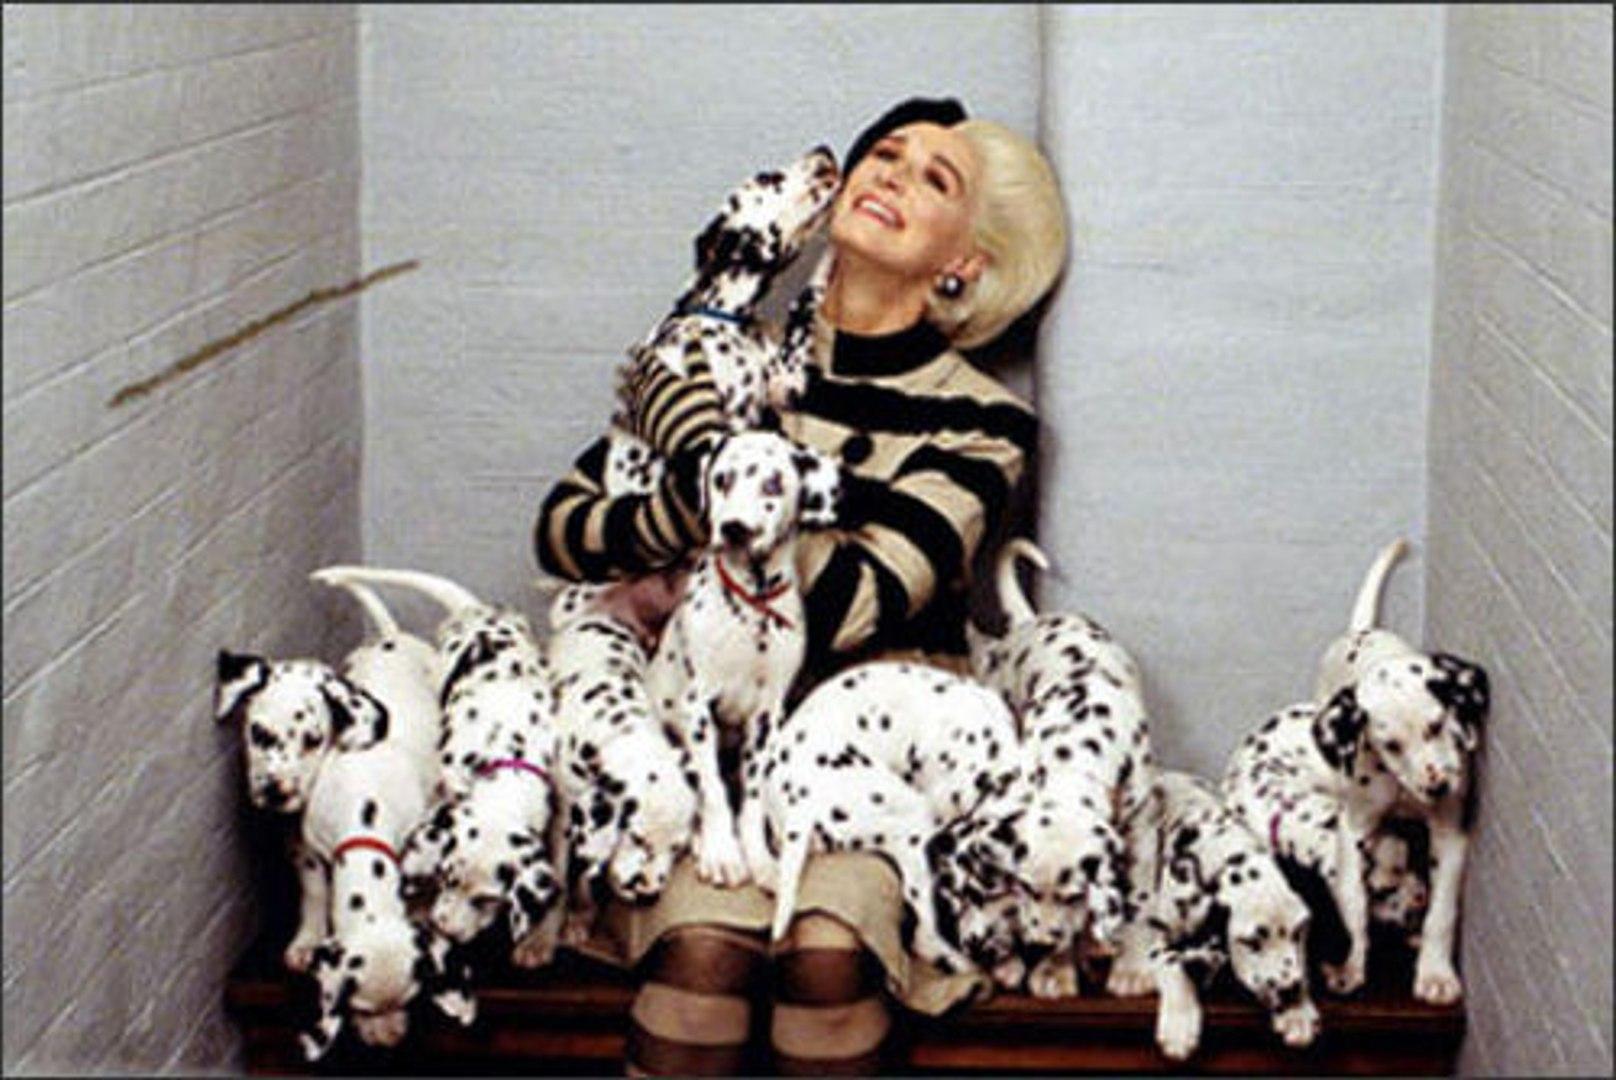 102 Dalmatians 2000 Full Movie Video Dailymotion